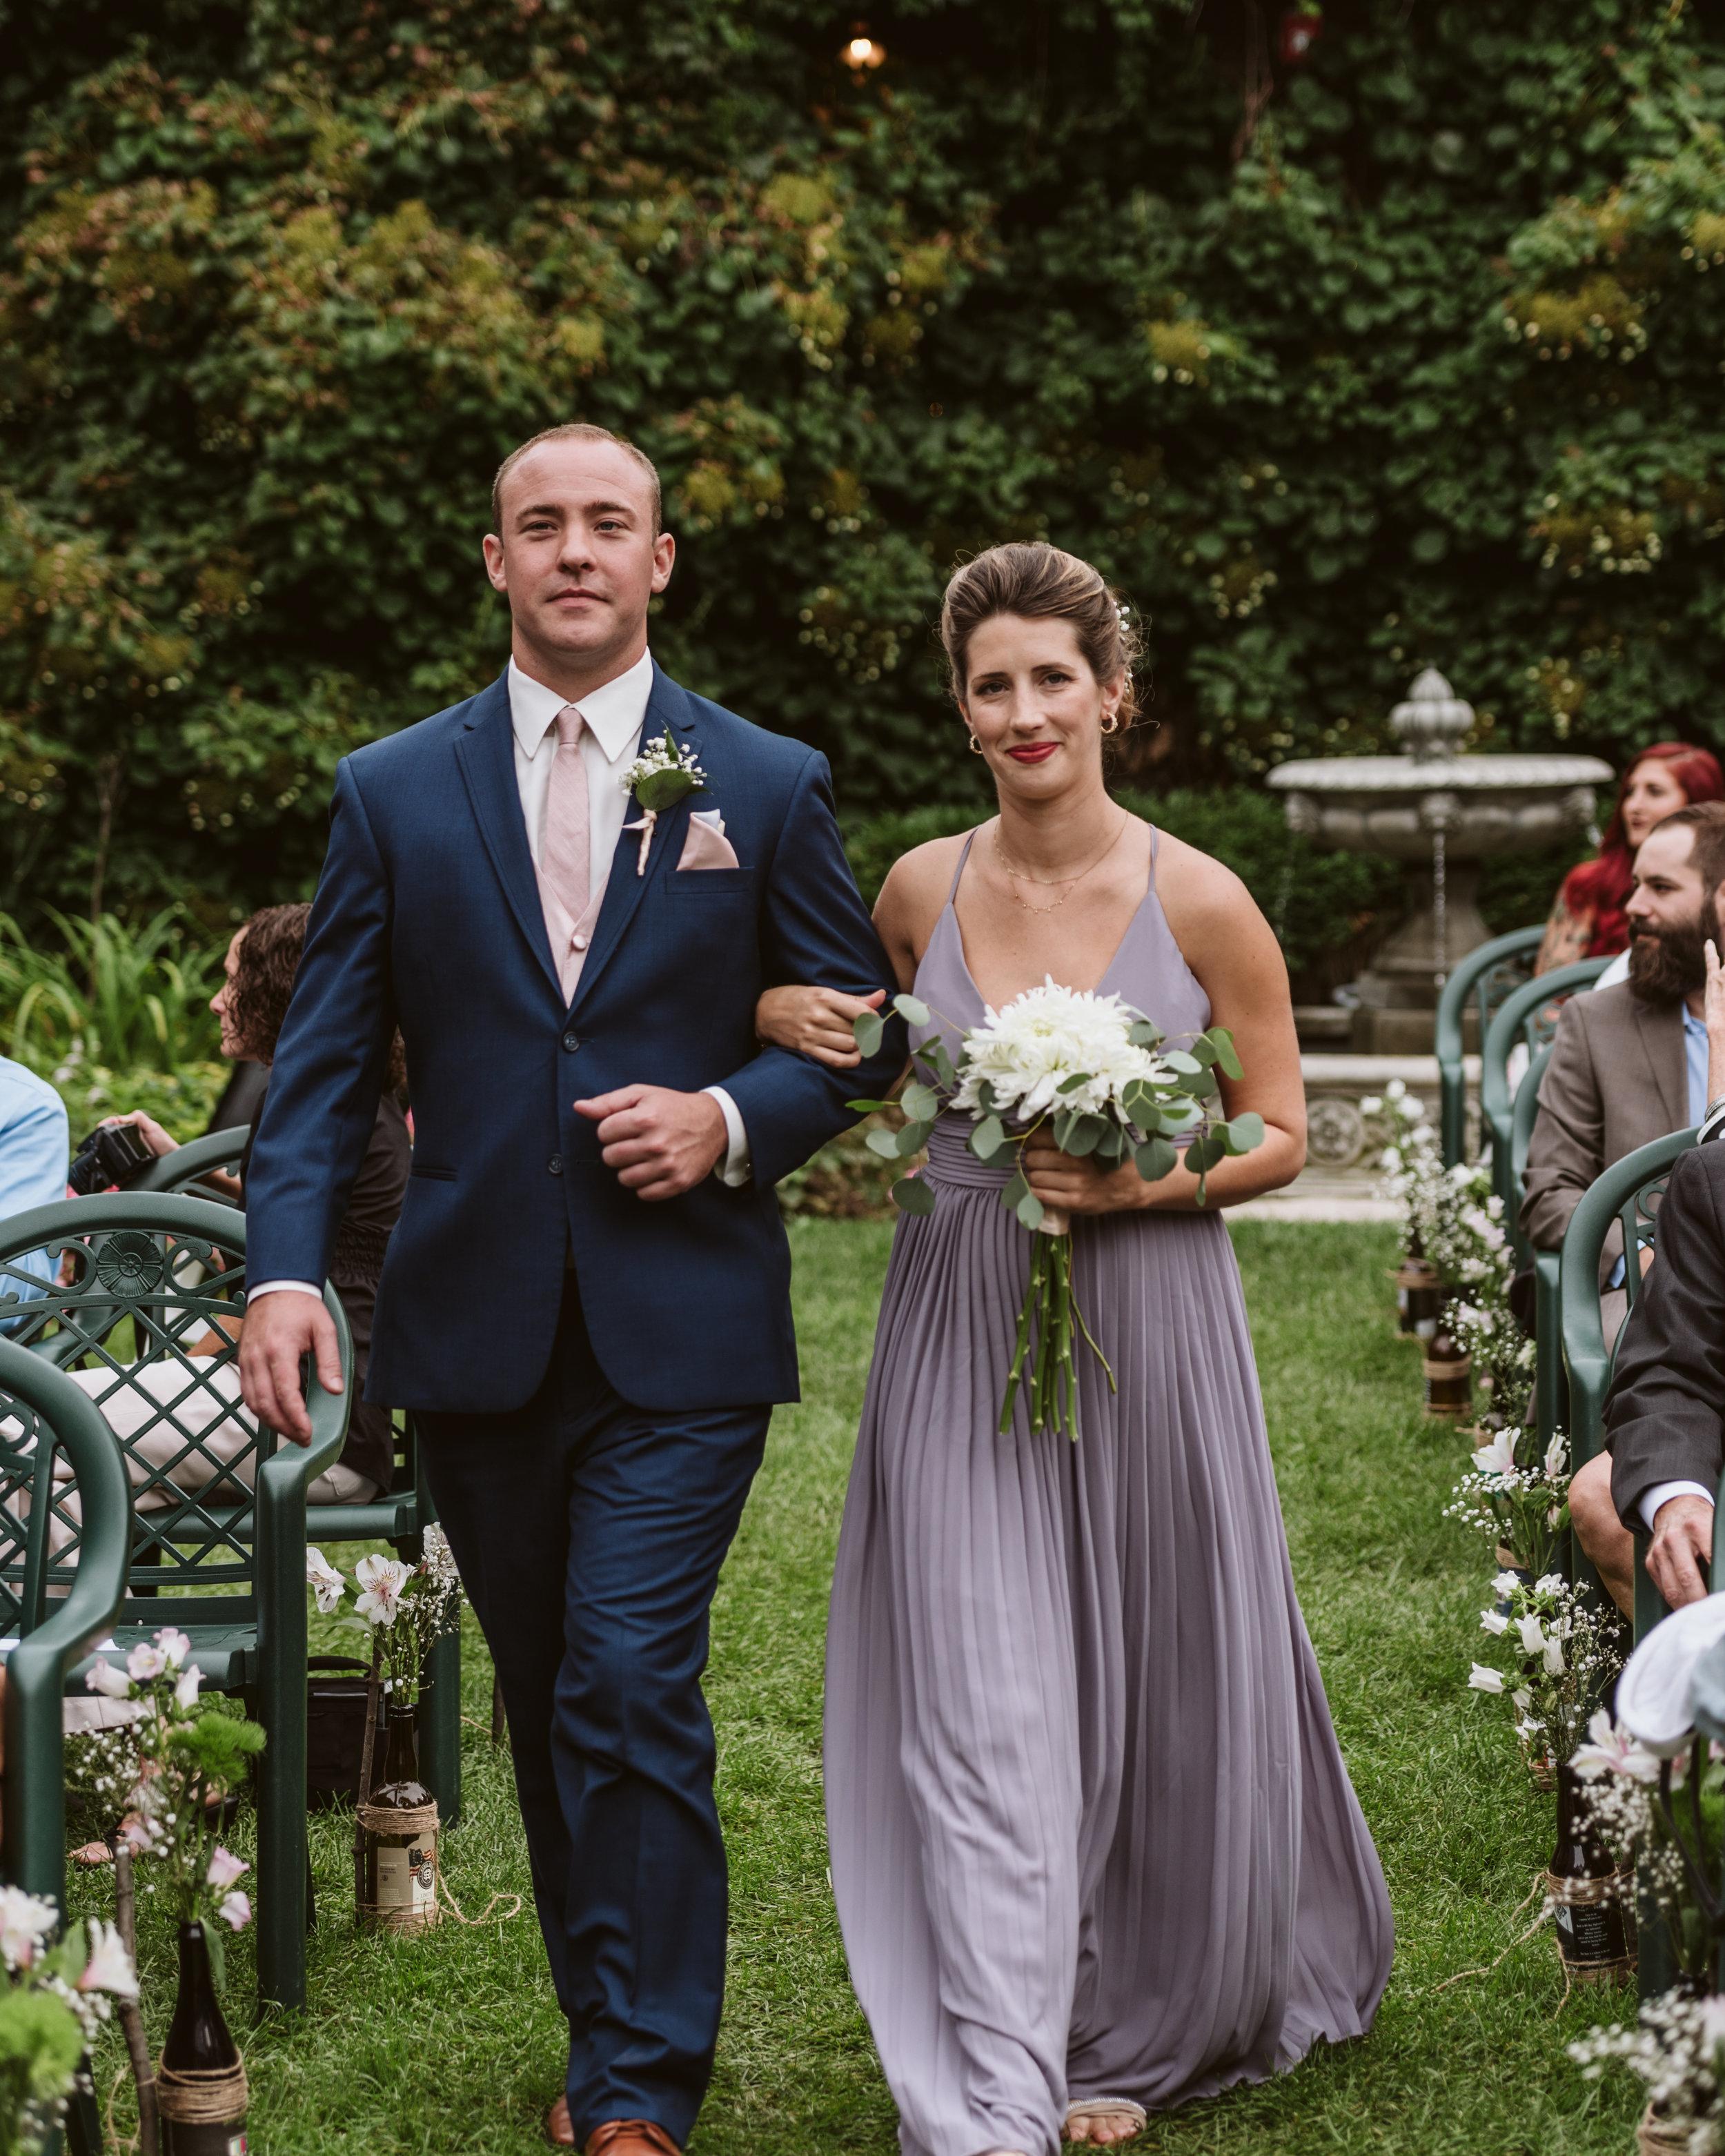 Horticultural_Hall_Lake_Geneva_wedding_Gavyn_Taylor_Photo_449.JPG